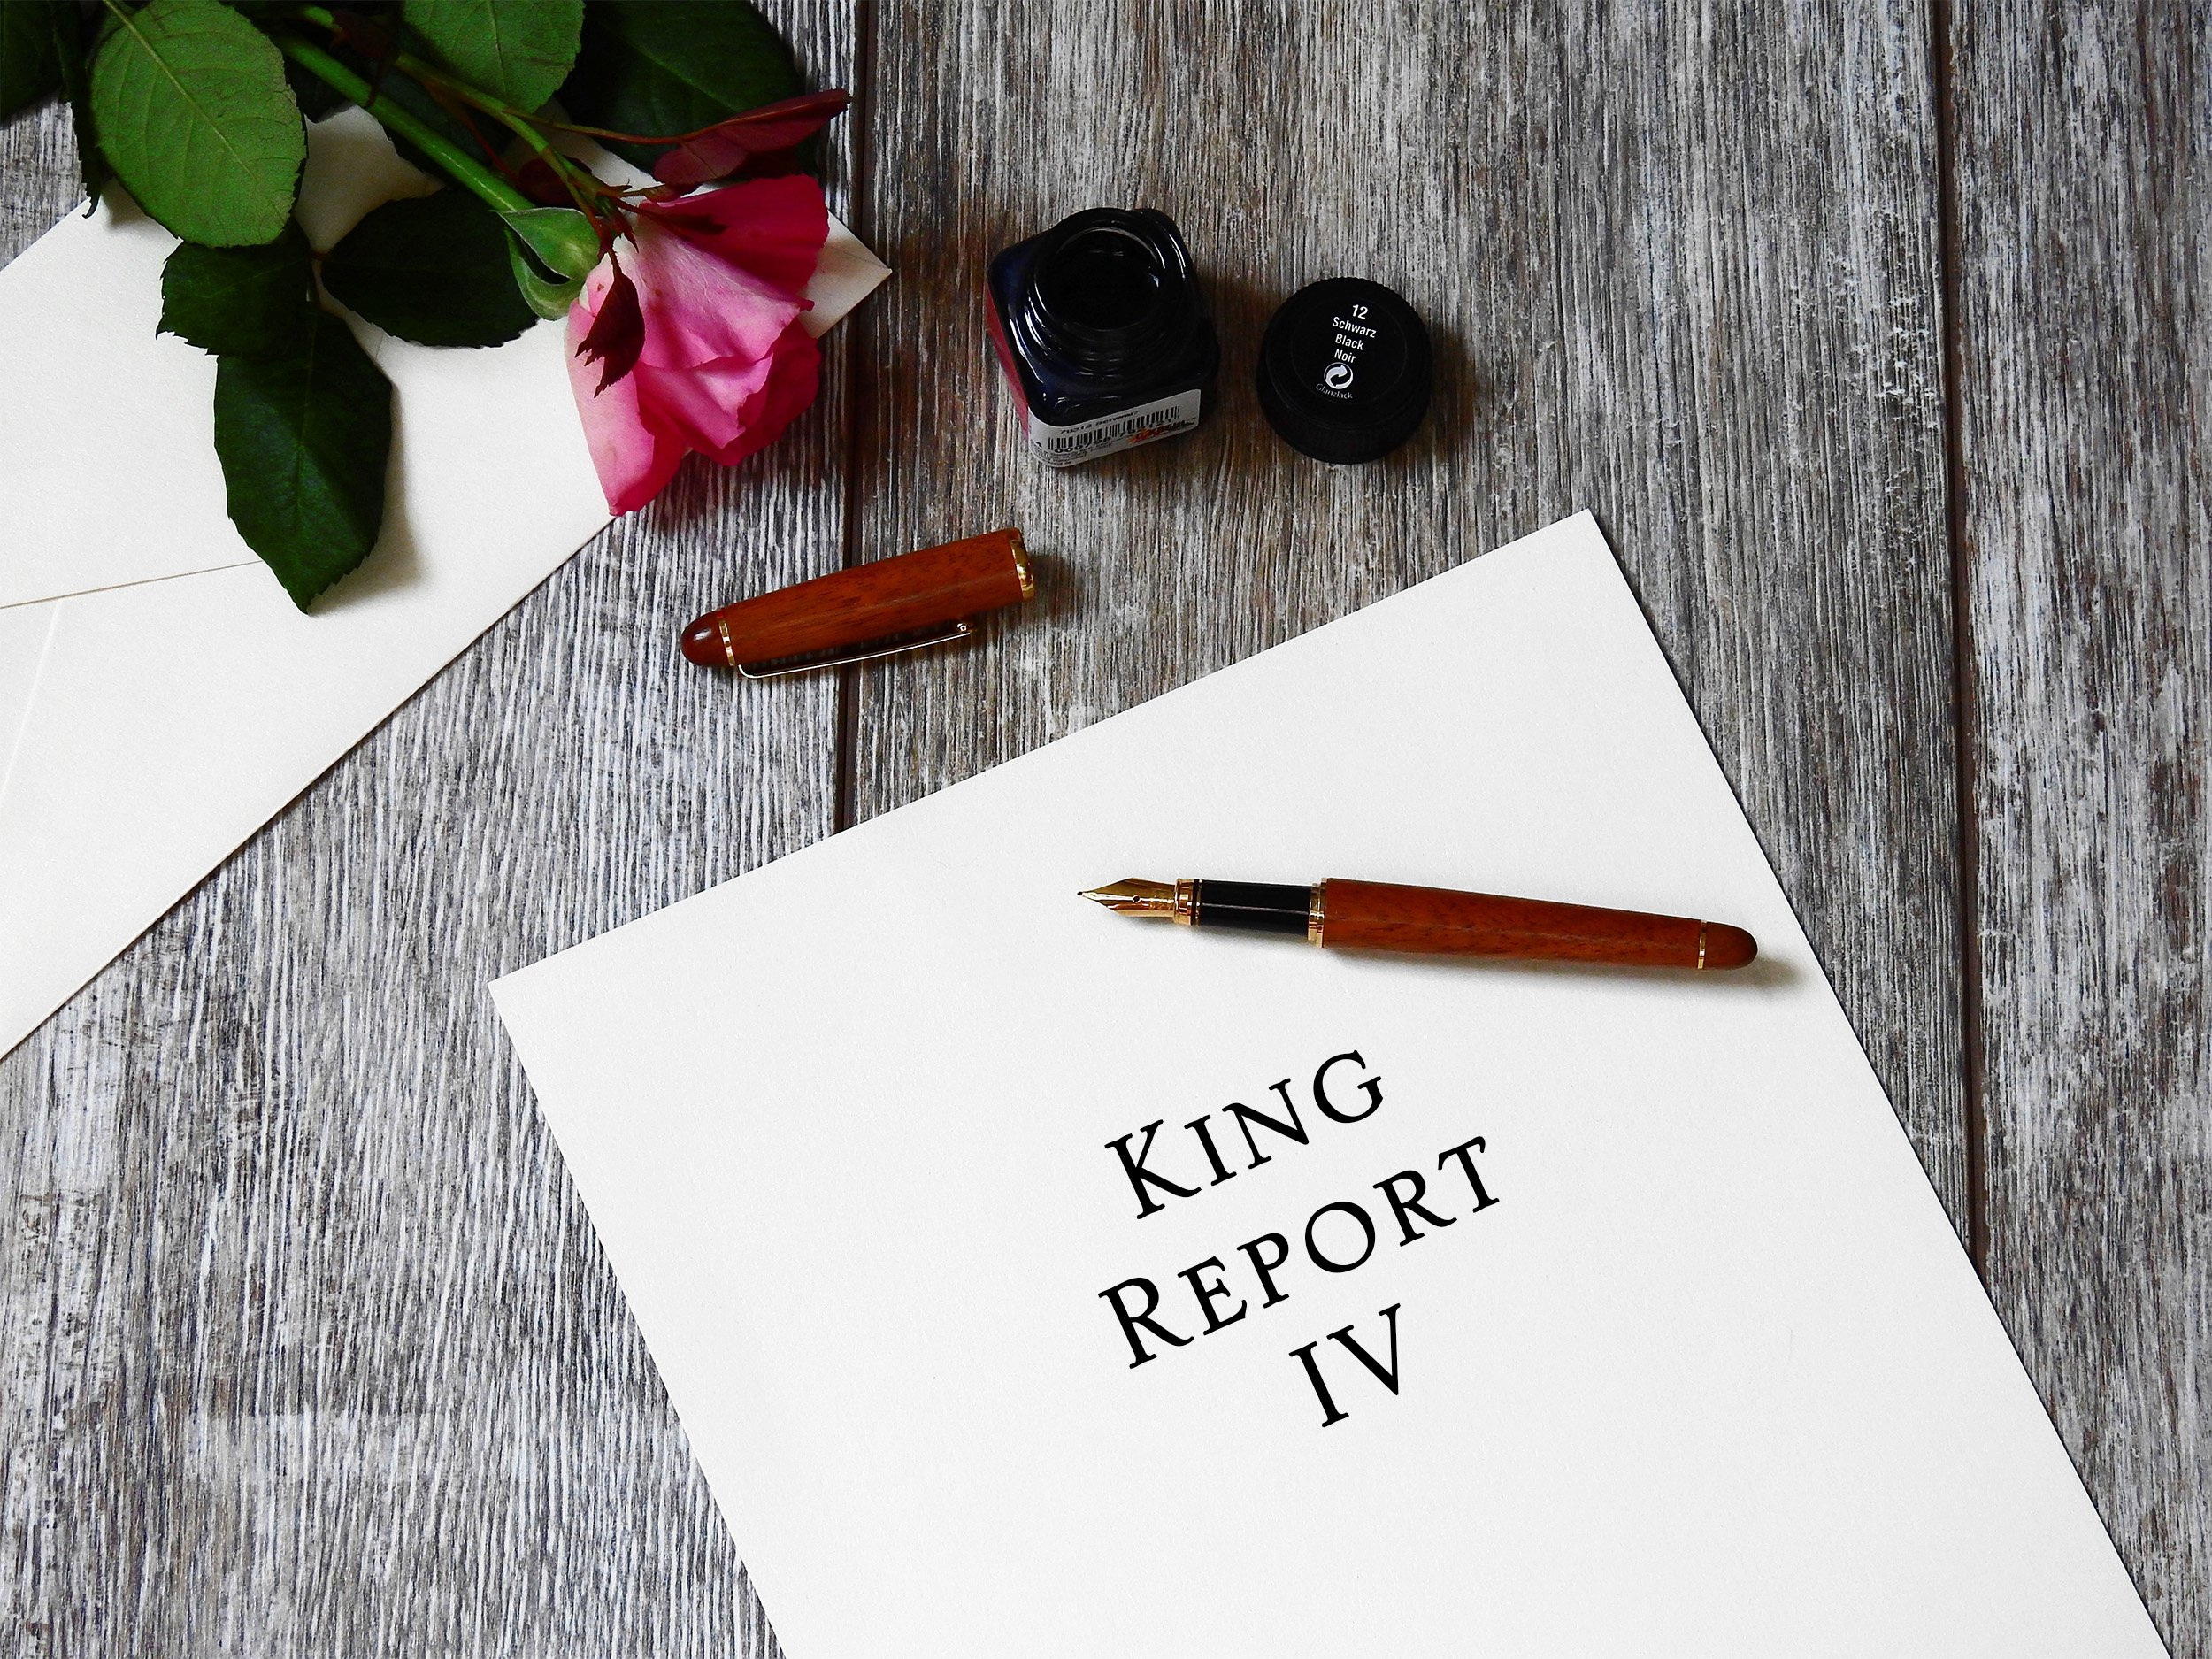 King III King IV article